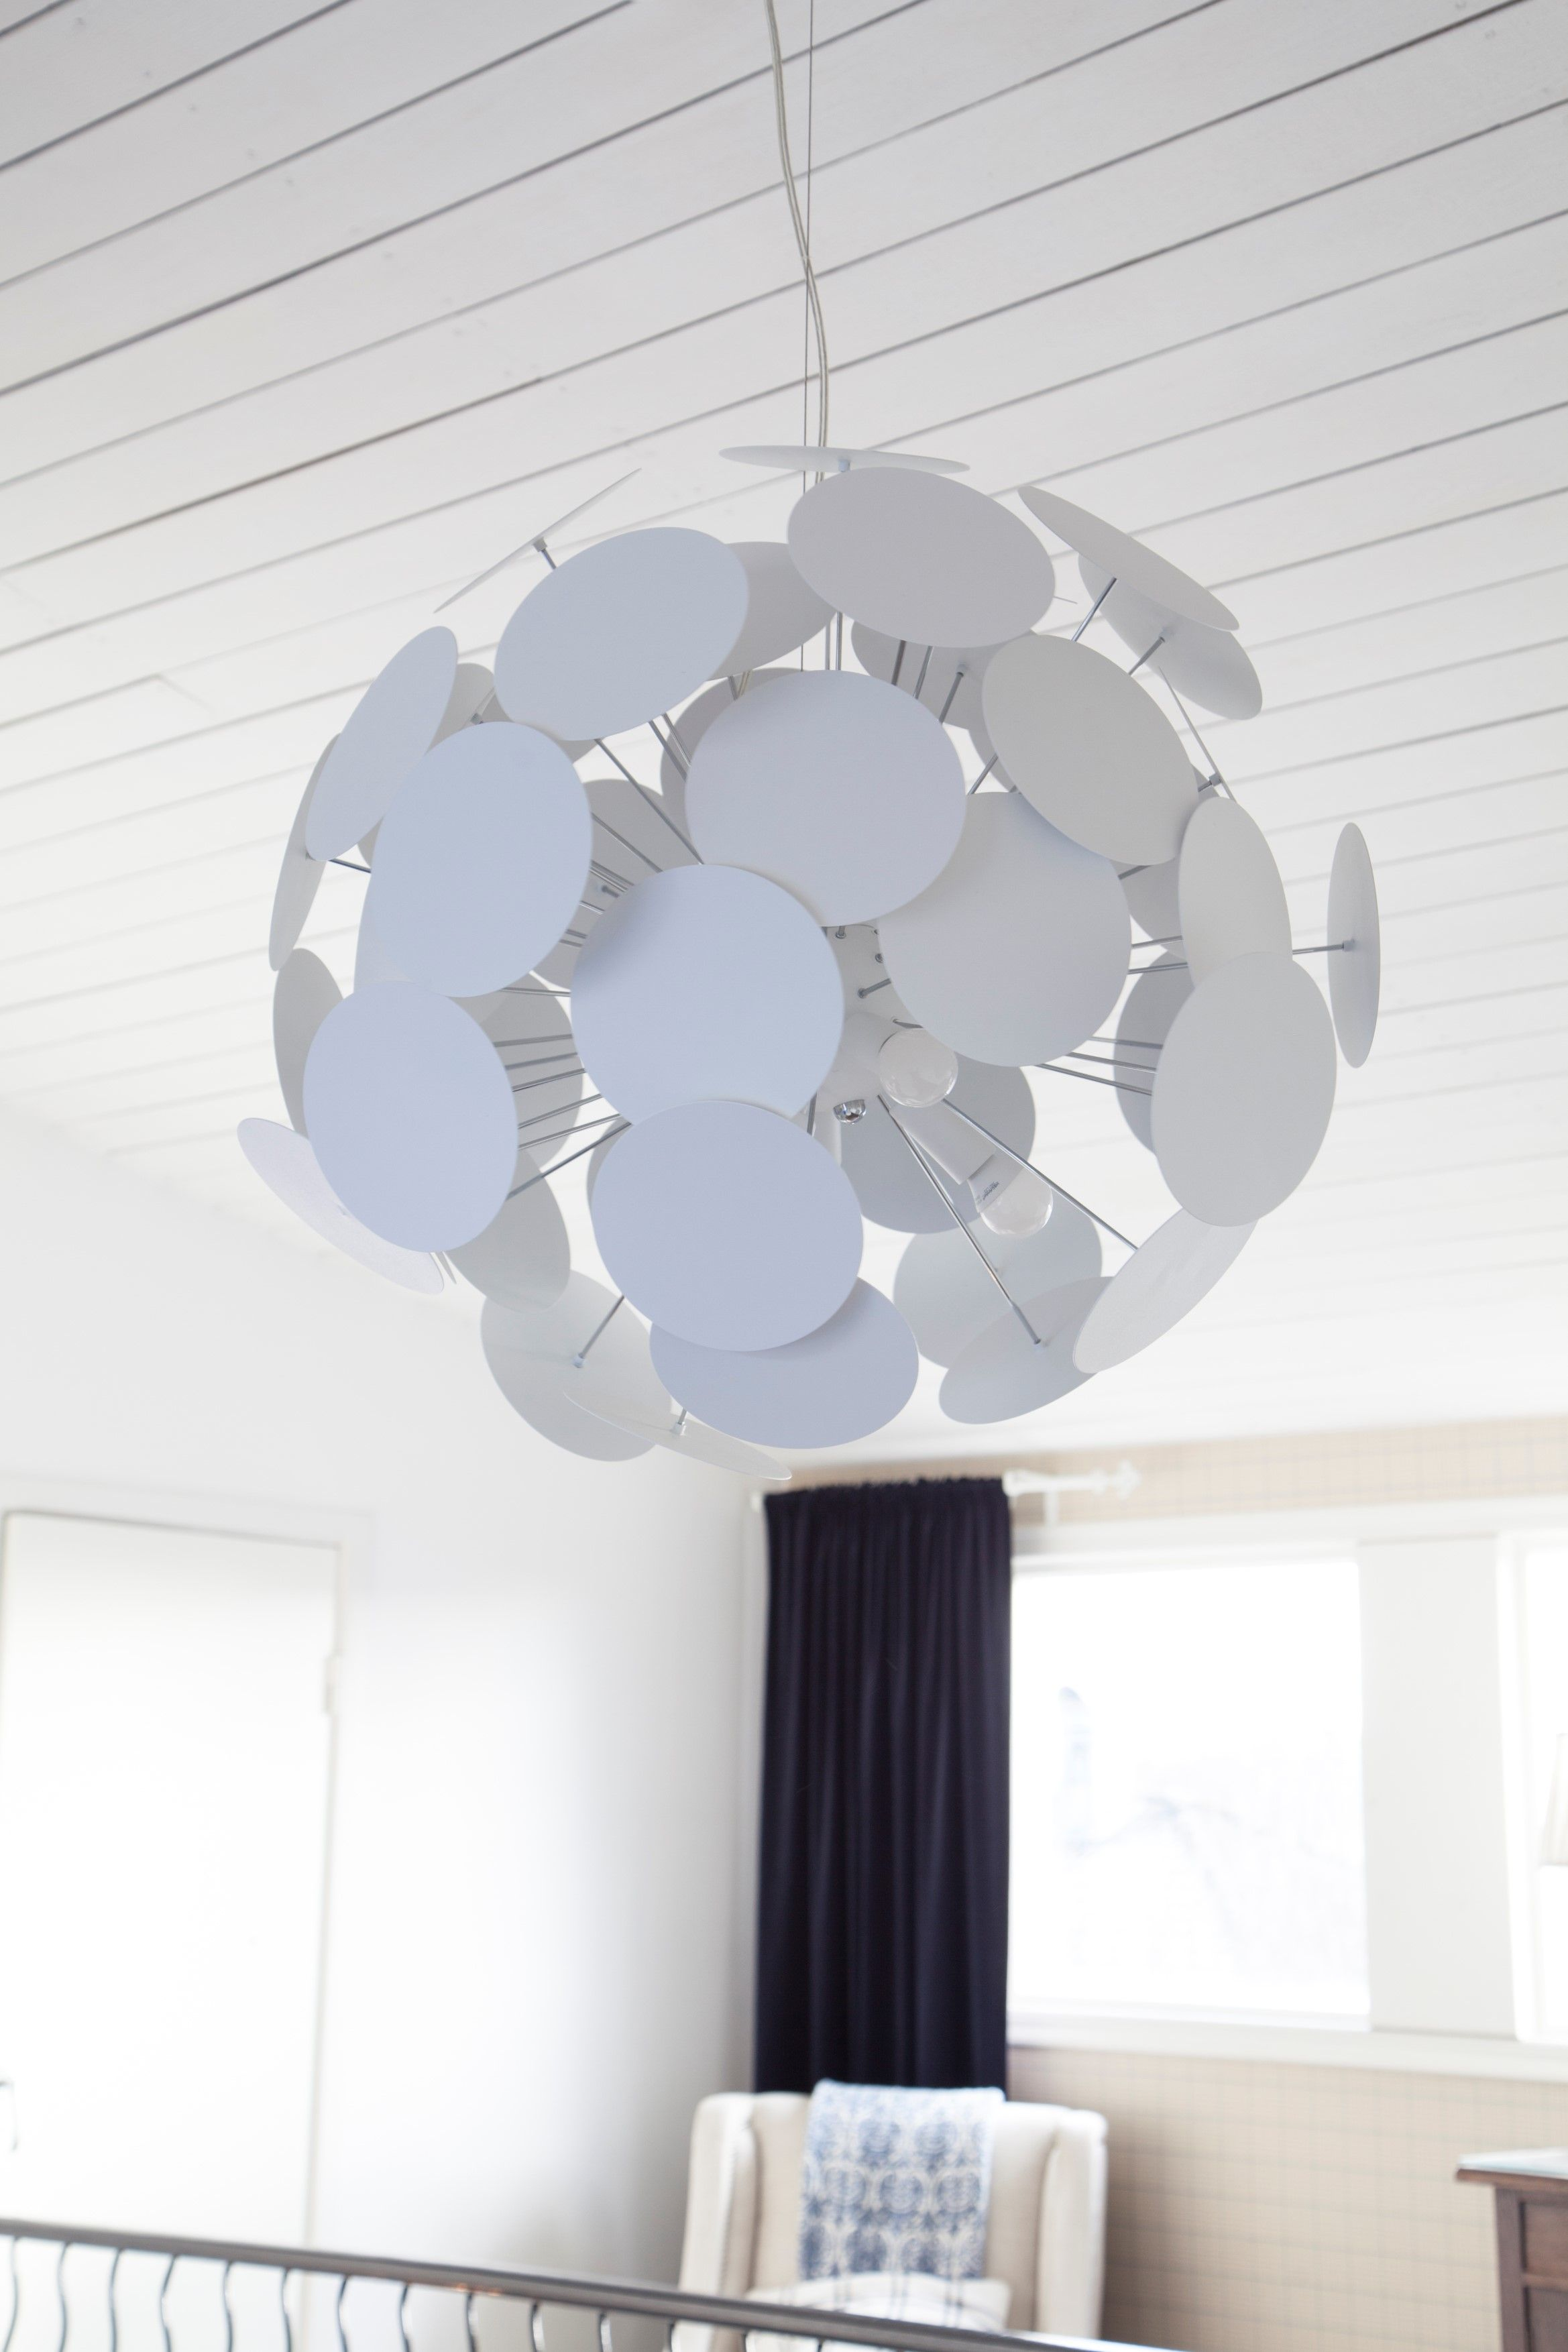 Super Modern Ceiling Lamp From Scandinavia Planet Is An